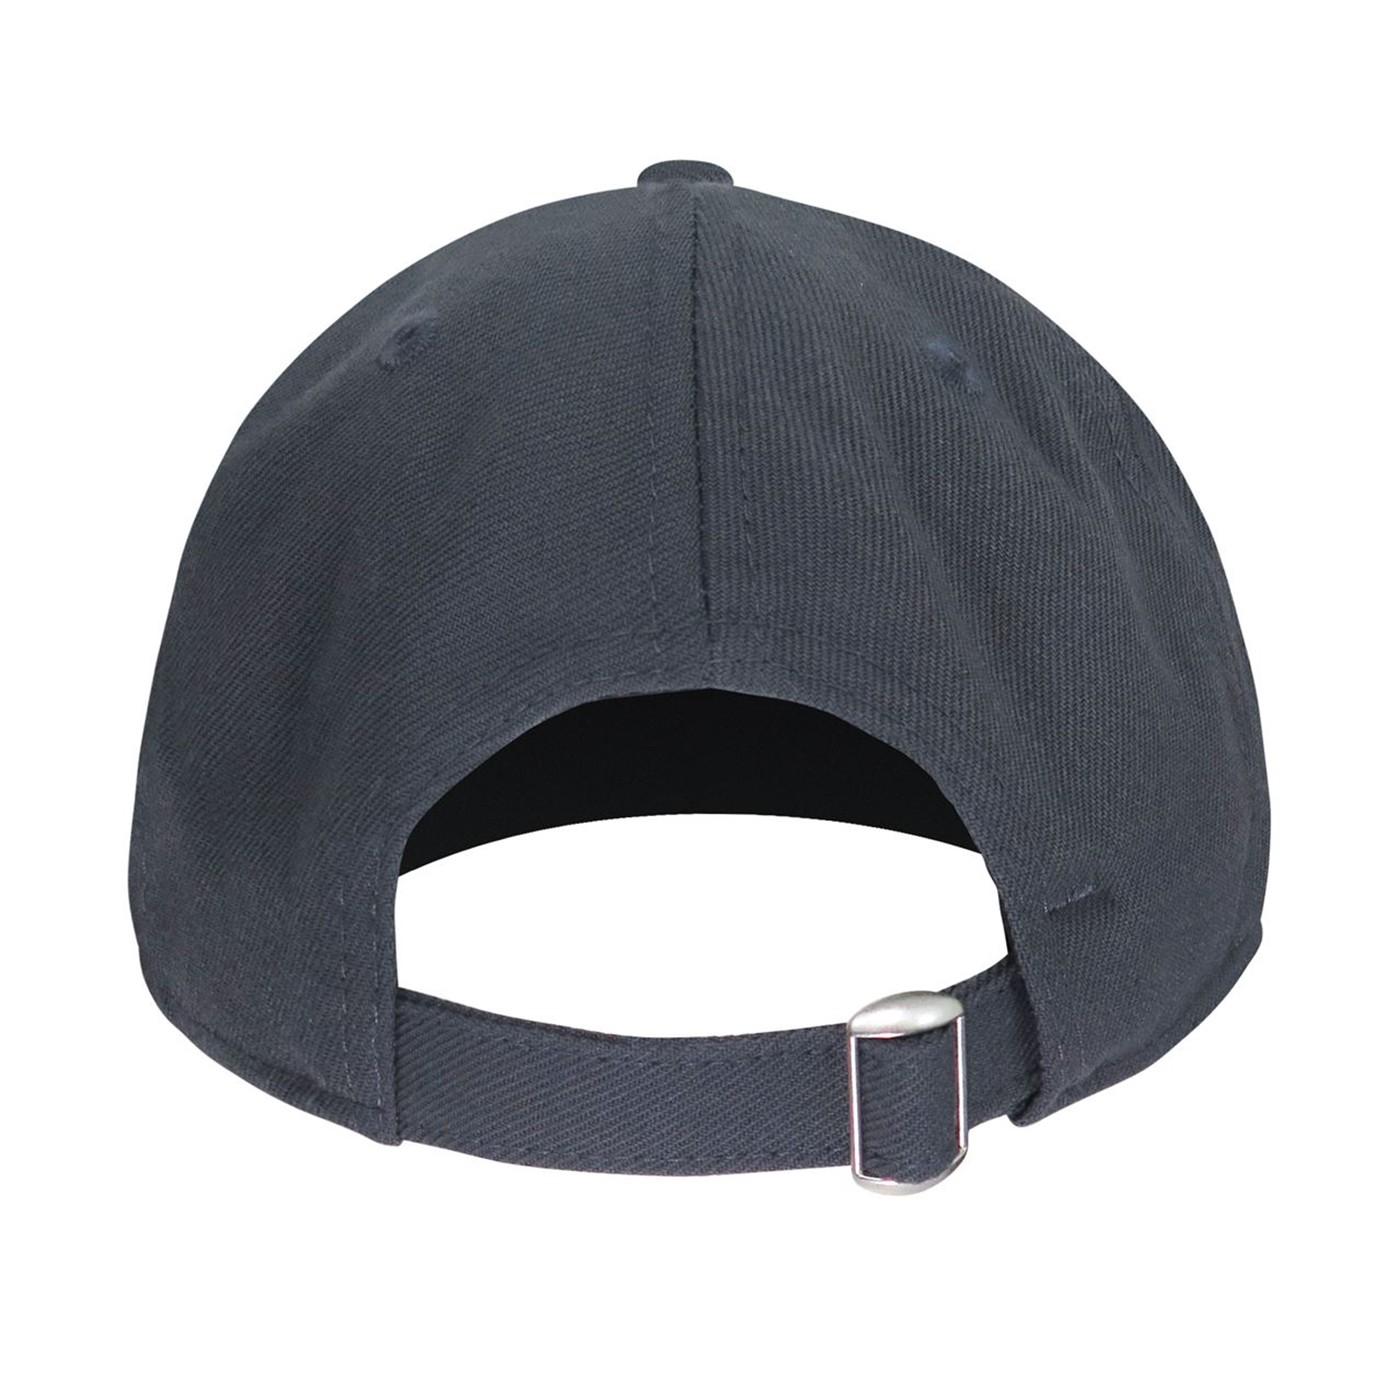 Ant-Man Pym Tech 9Twenty Adjustable Hat